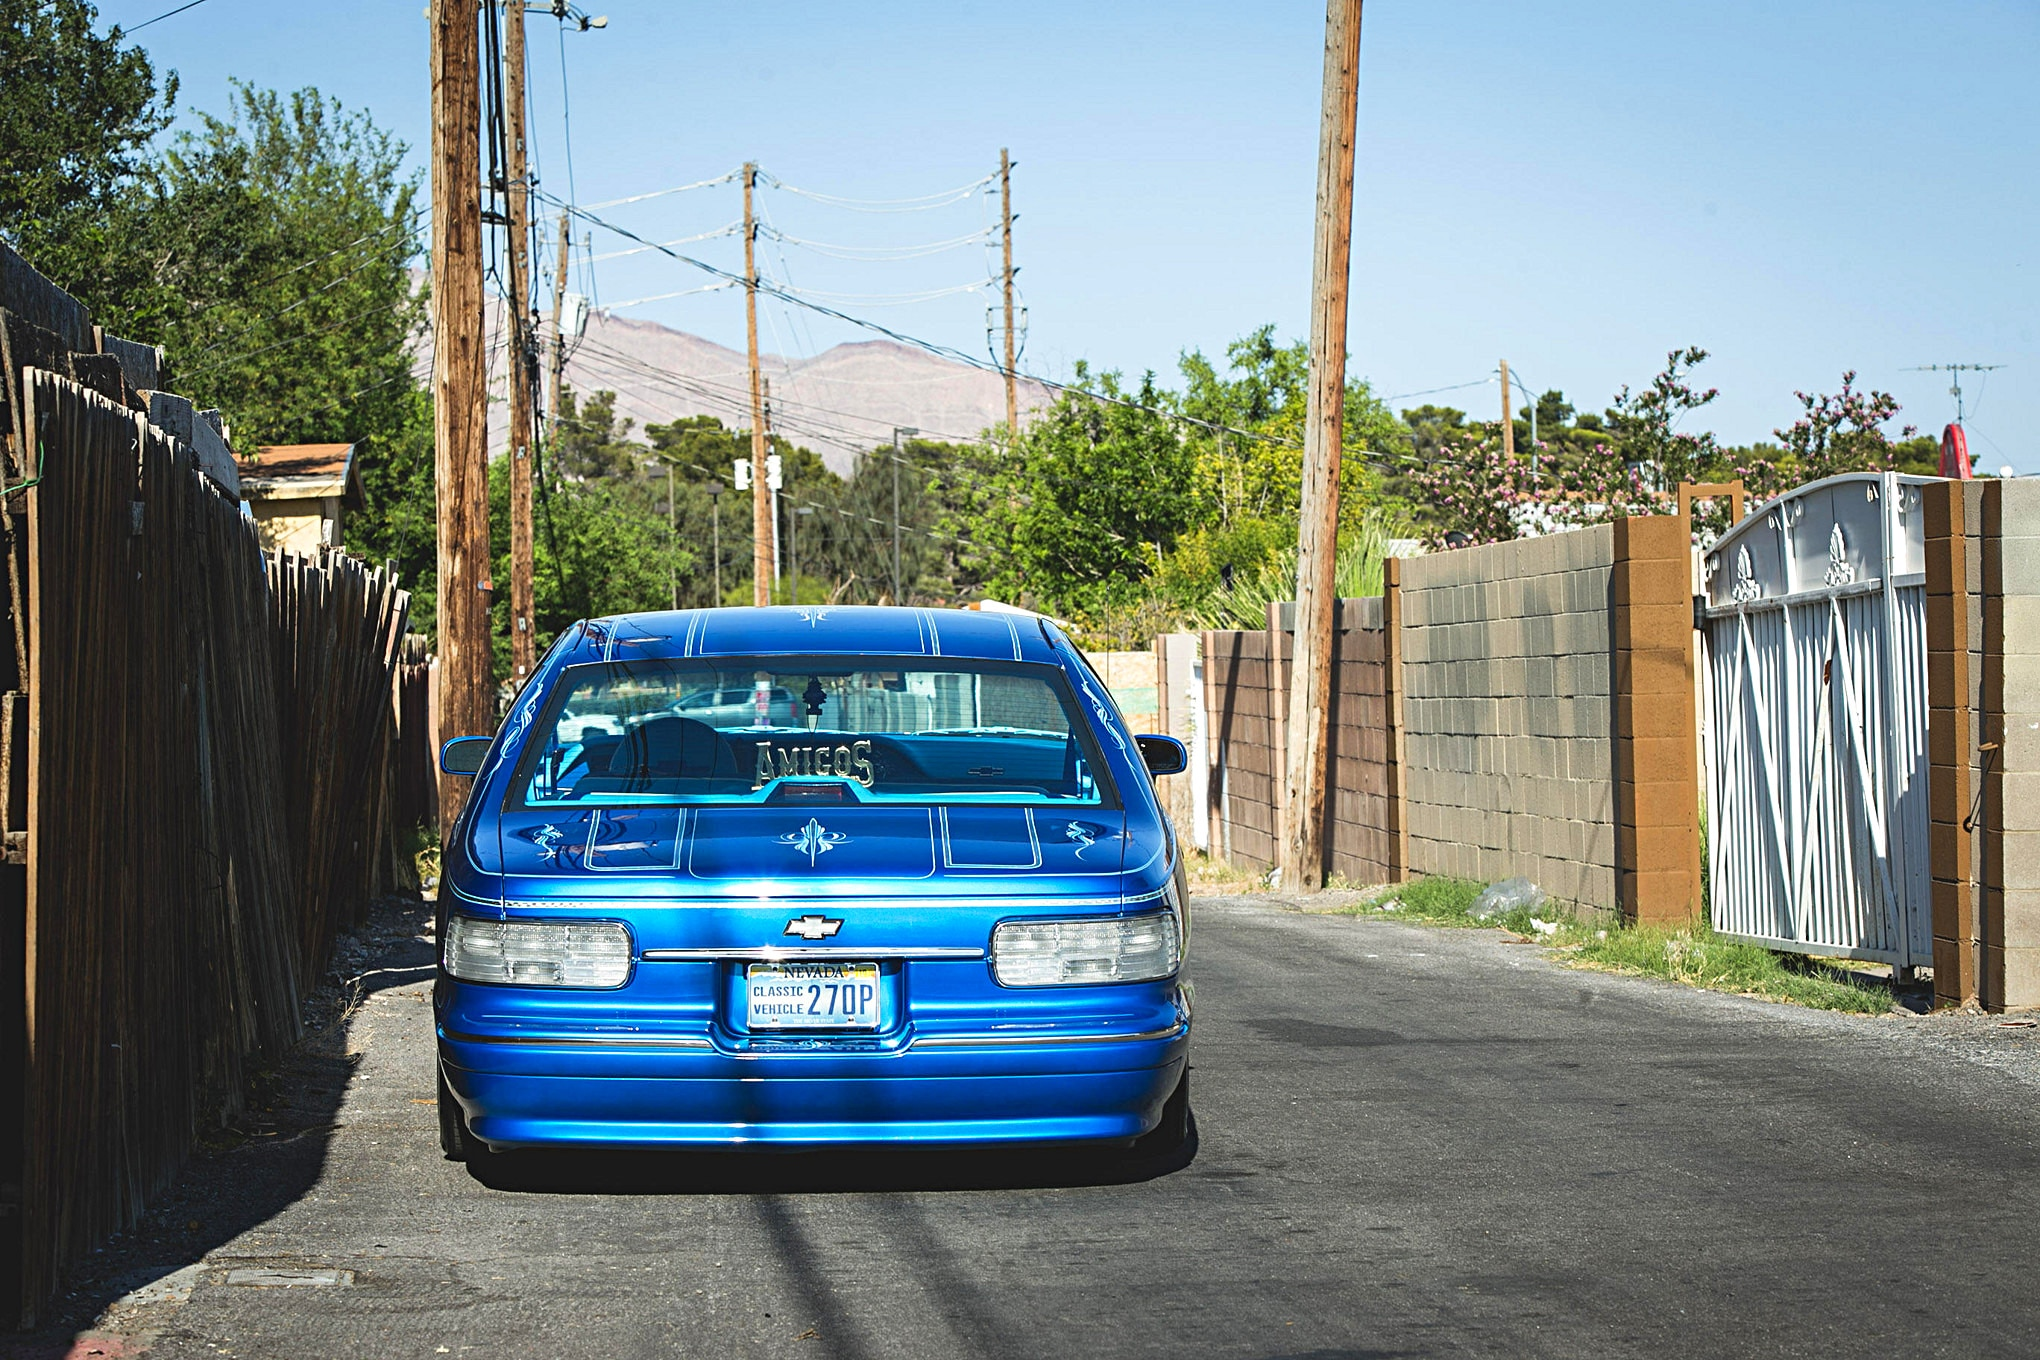 1992 Chevrolet Caprice Rear Bumper